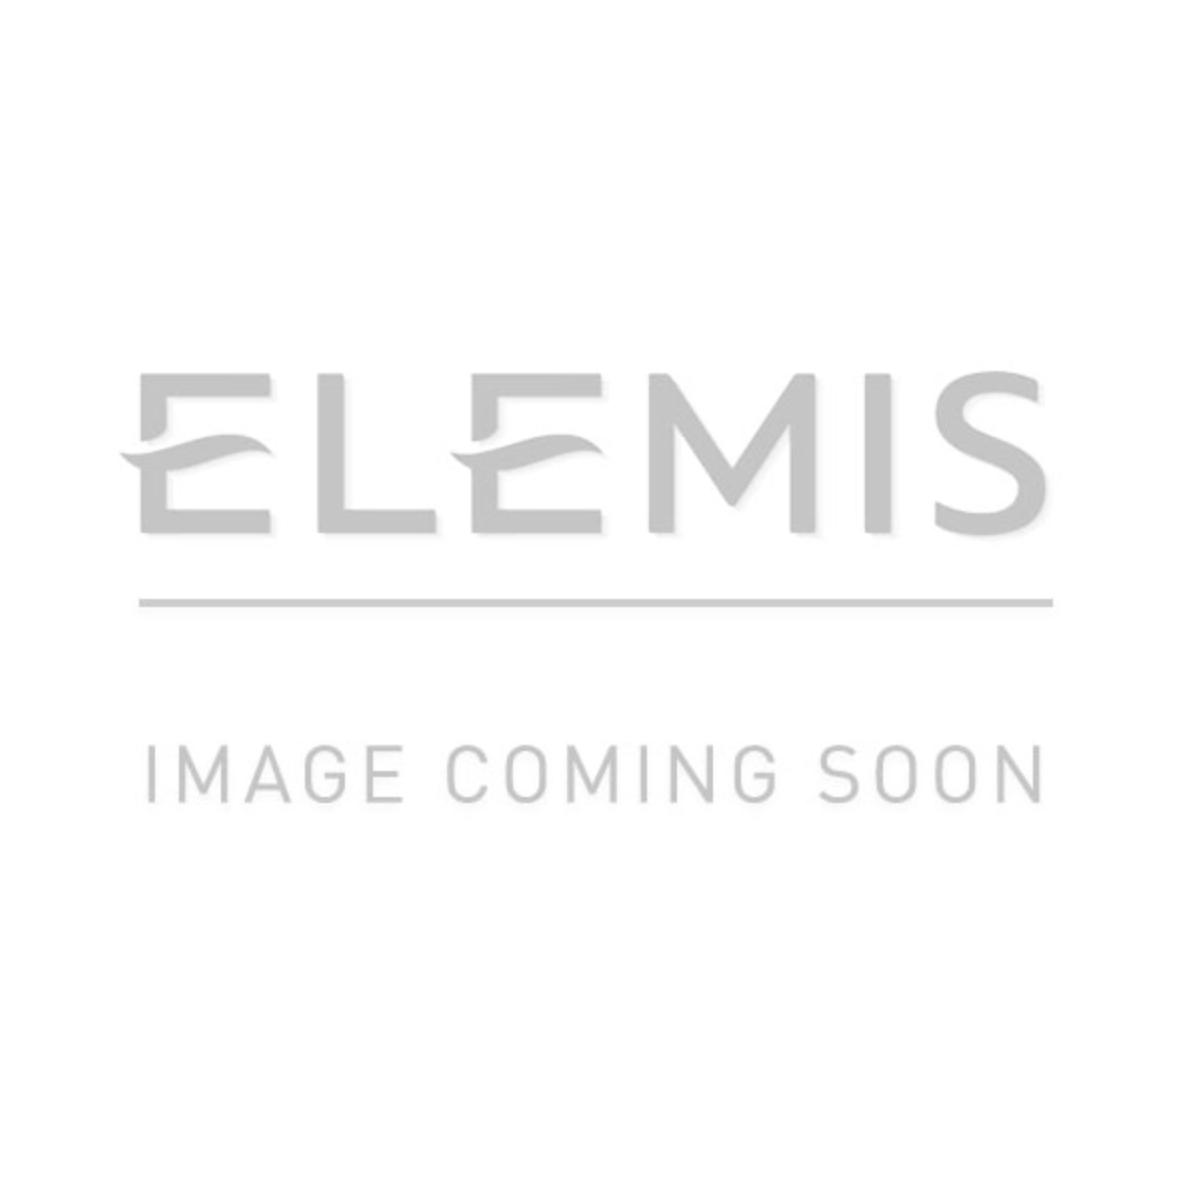 Buy ELEMIS Pro-Collagen Oxygenating Night Cream, Anti-wrinkle Night Cream, fl. oz. on gresincomri.ga FREE SHIPPING on qualified orders.